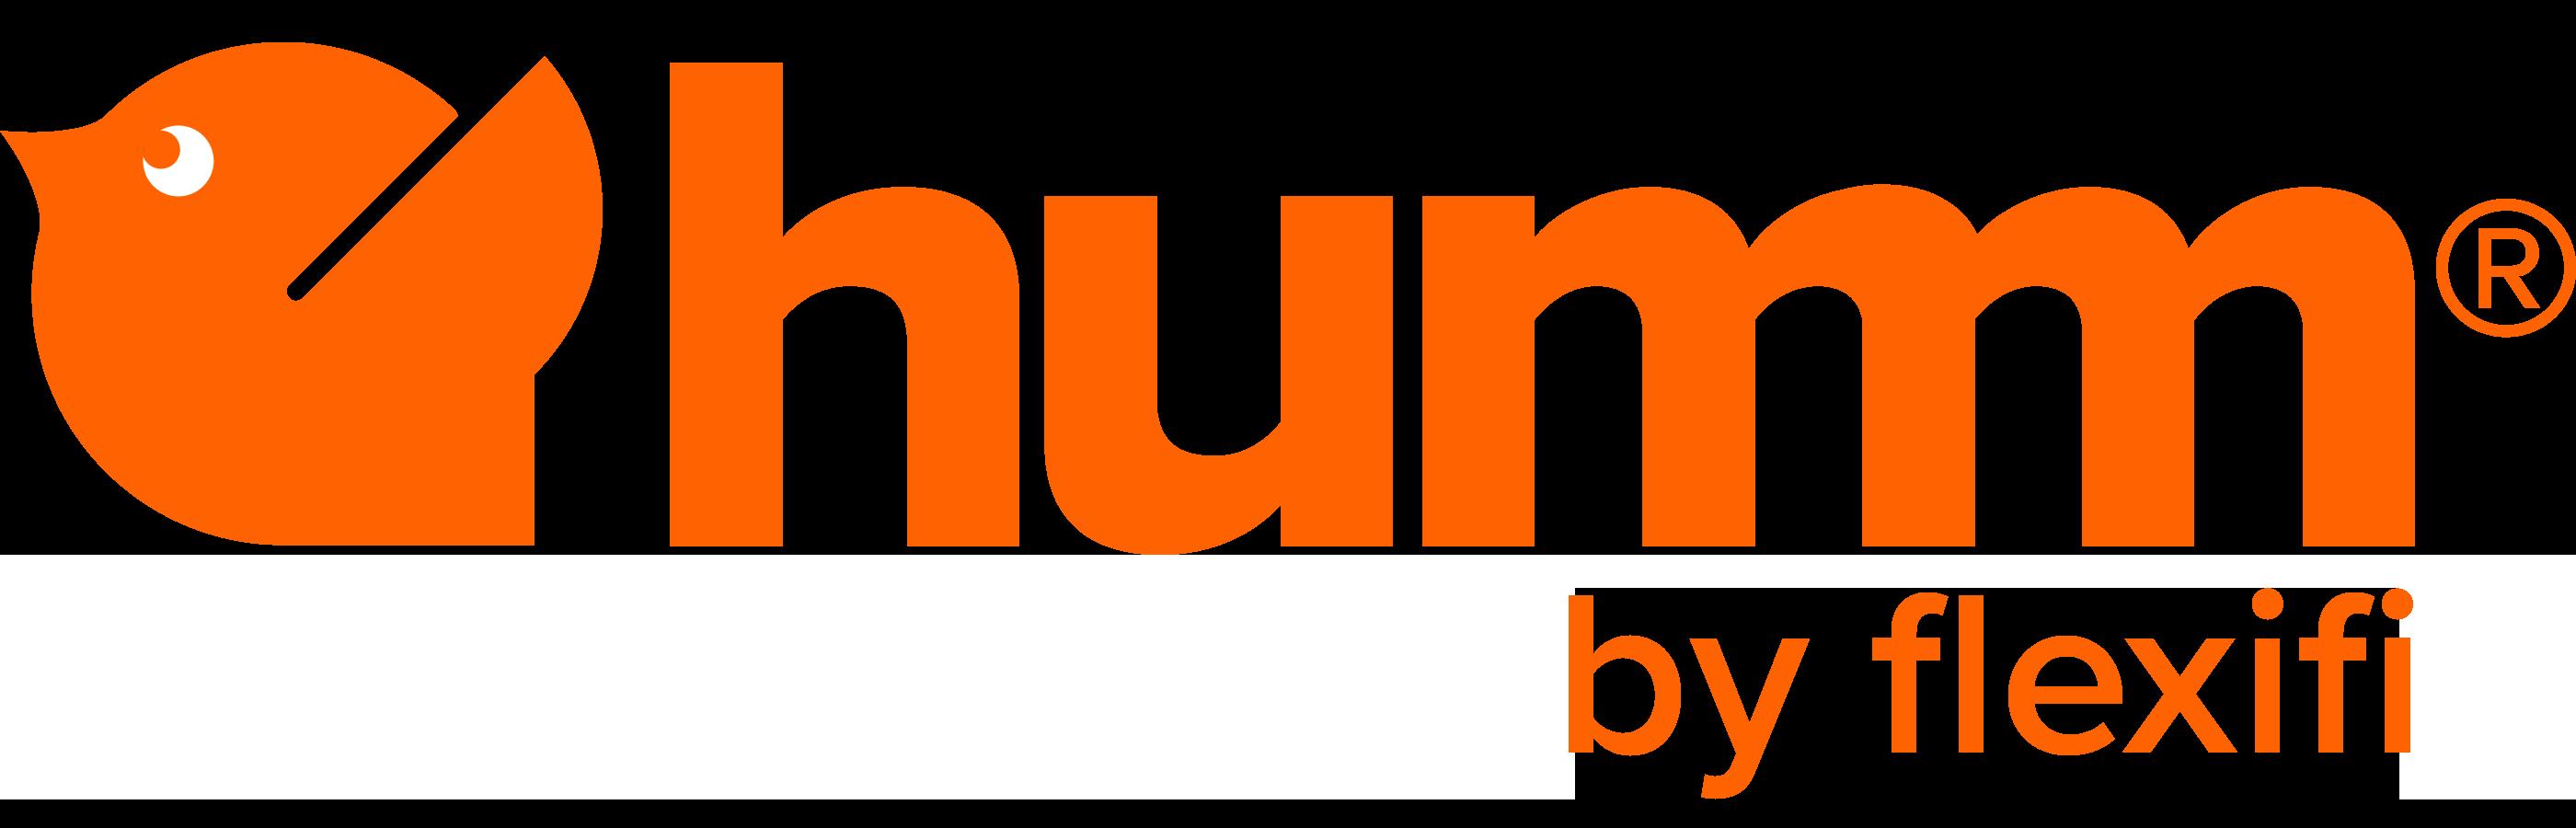 https://apply.flexifi.com/resource/1601497151000/FlxResourceZip/assets/images/humm_Logo_7.png